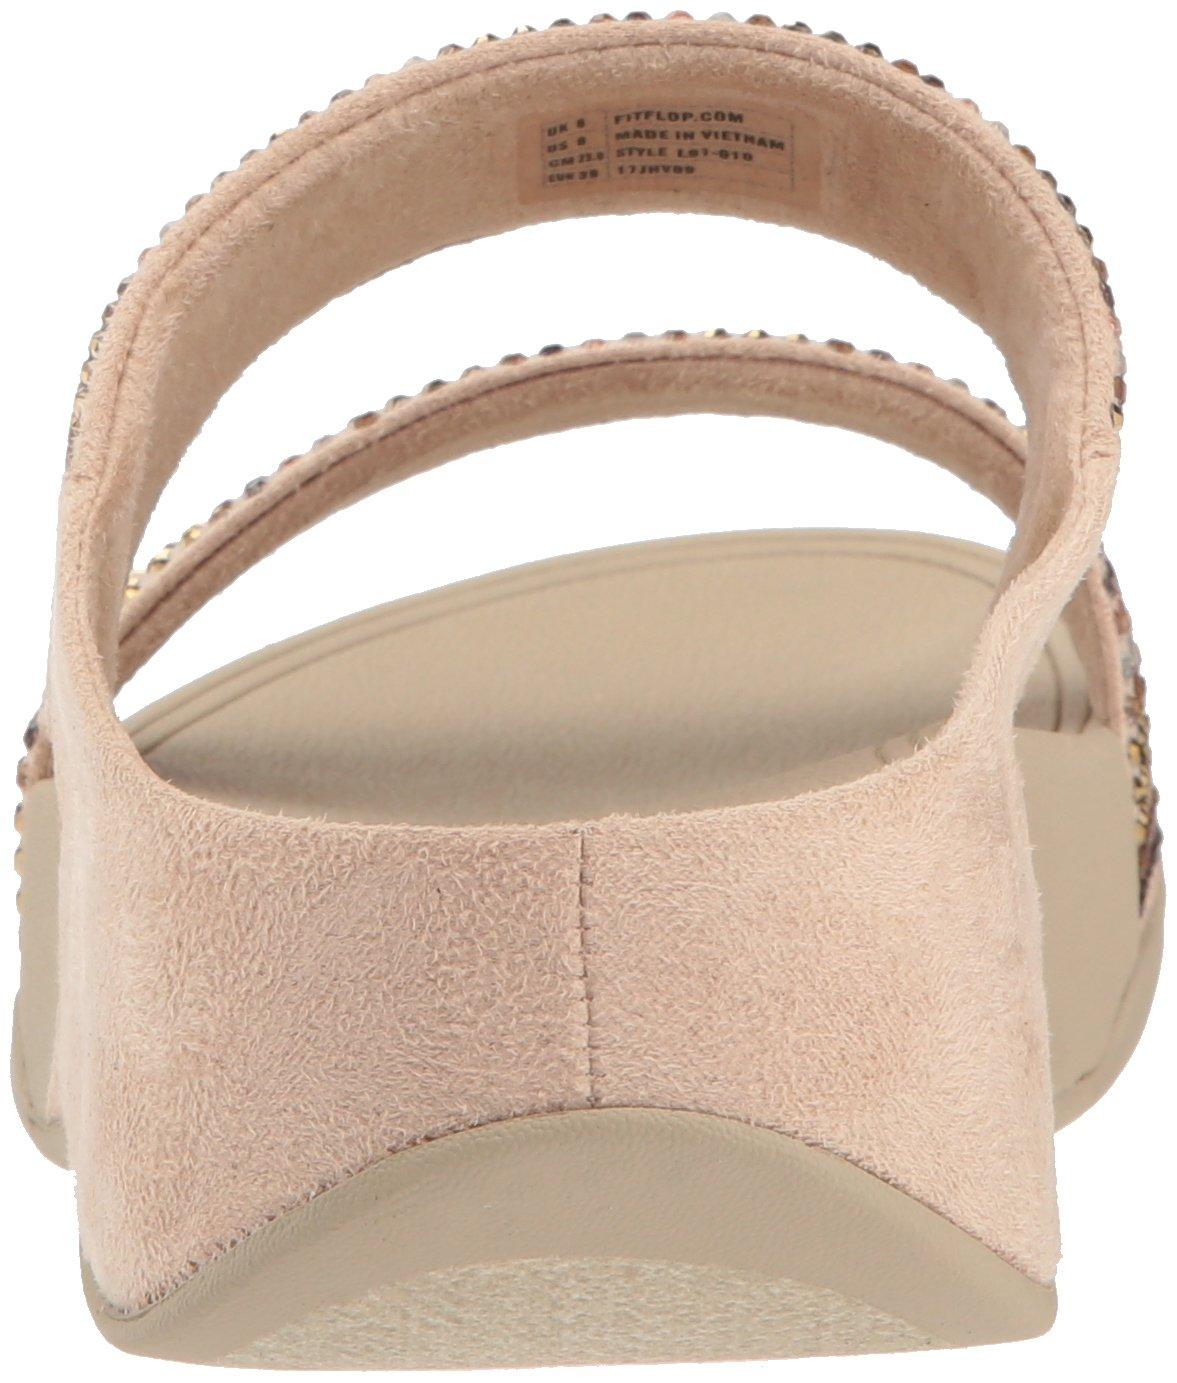 944bd3d62758d3 ... FitFlop Women s Flare Strobe B(M) Slide Sandal B07995P1SL 7 B(M) ...